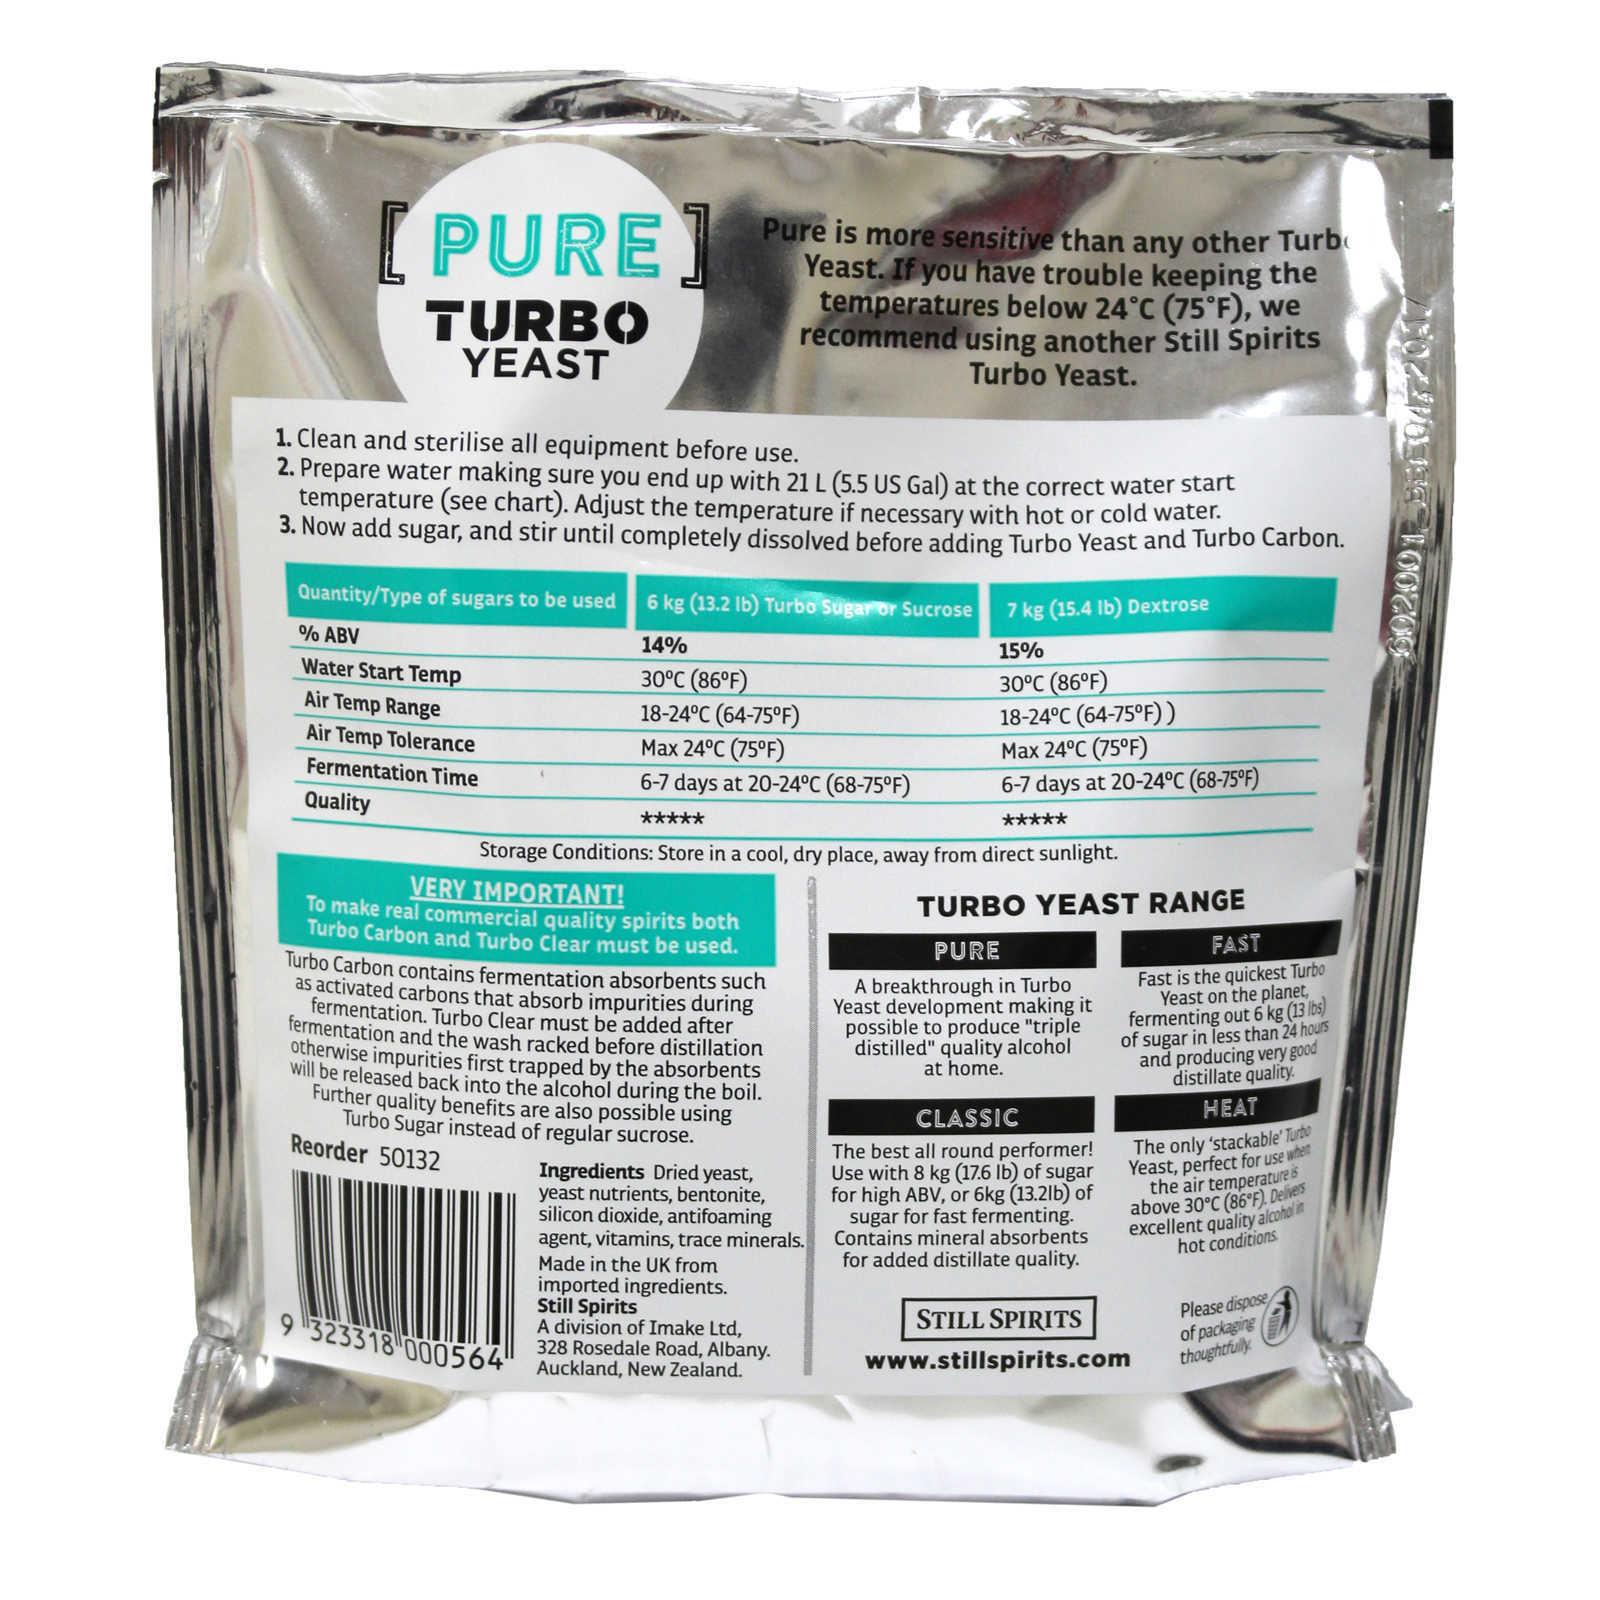 still spirits triple distilled turbo yeast instructions